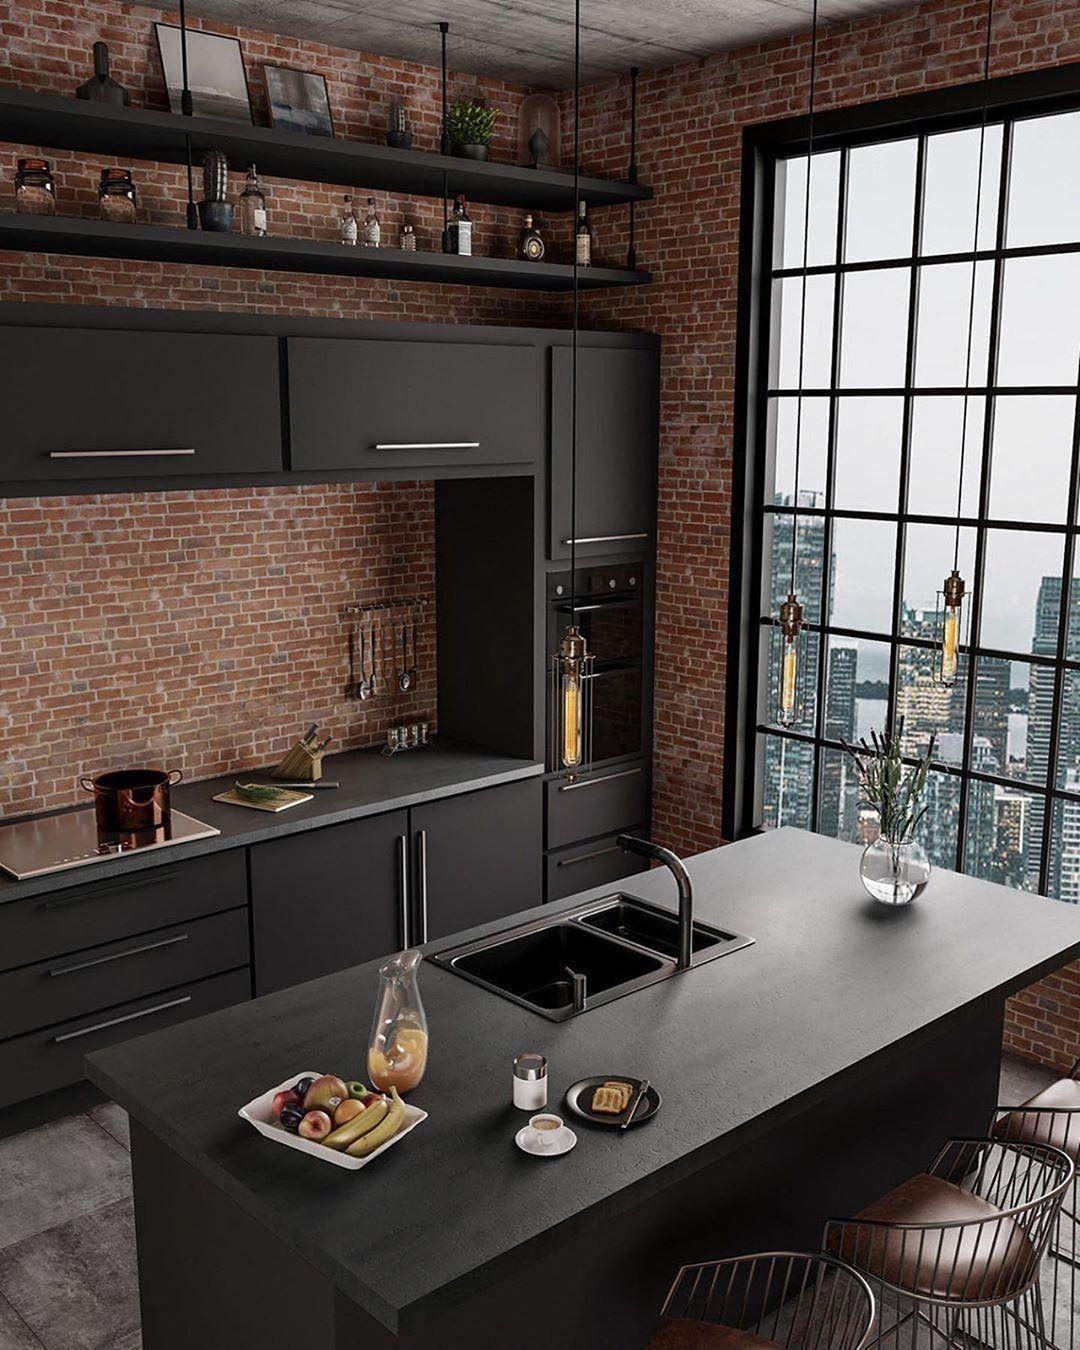 Industrial Kitchen Style By Caroline Ki Kitchen - Room Decor